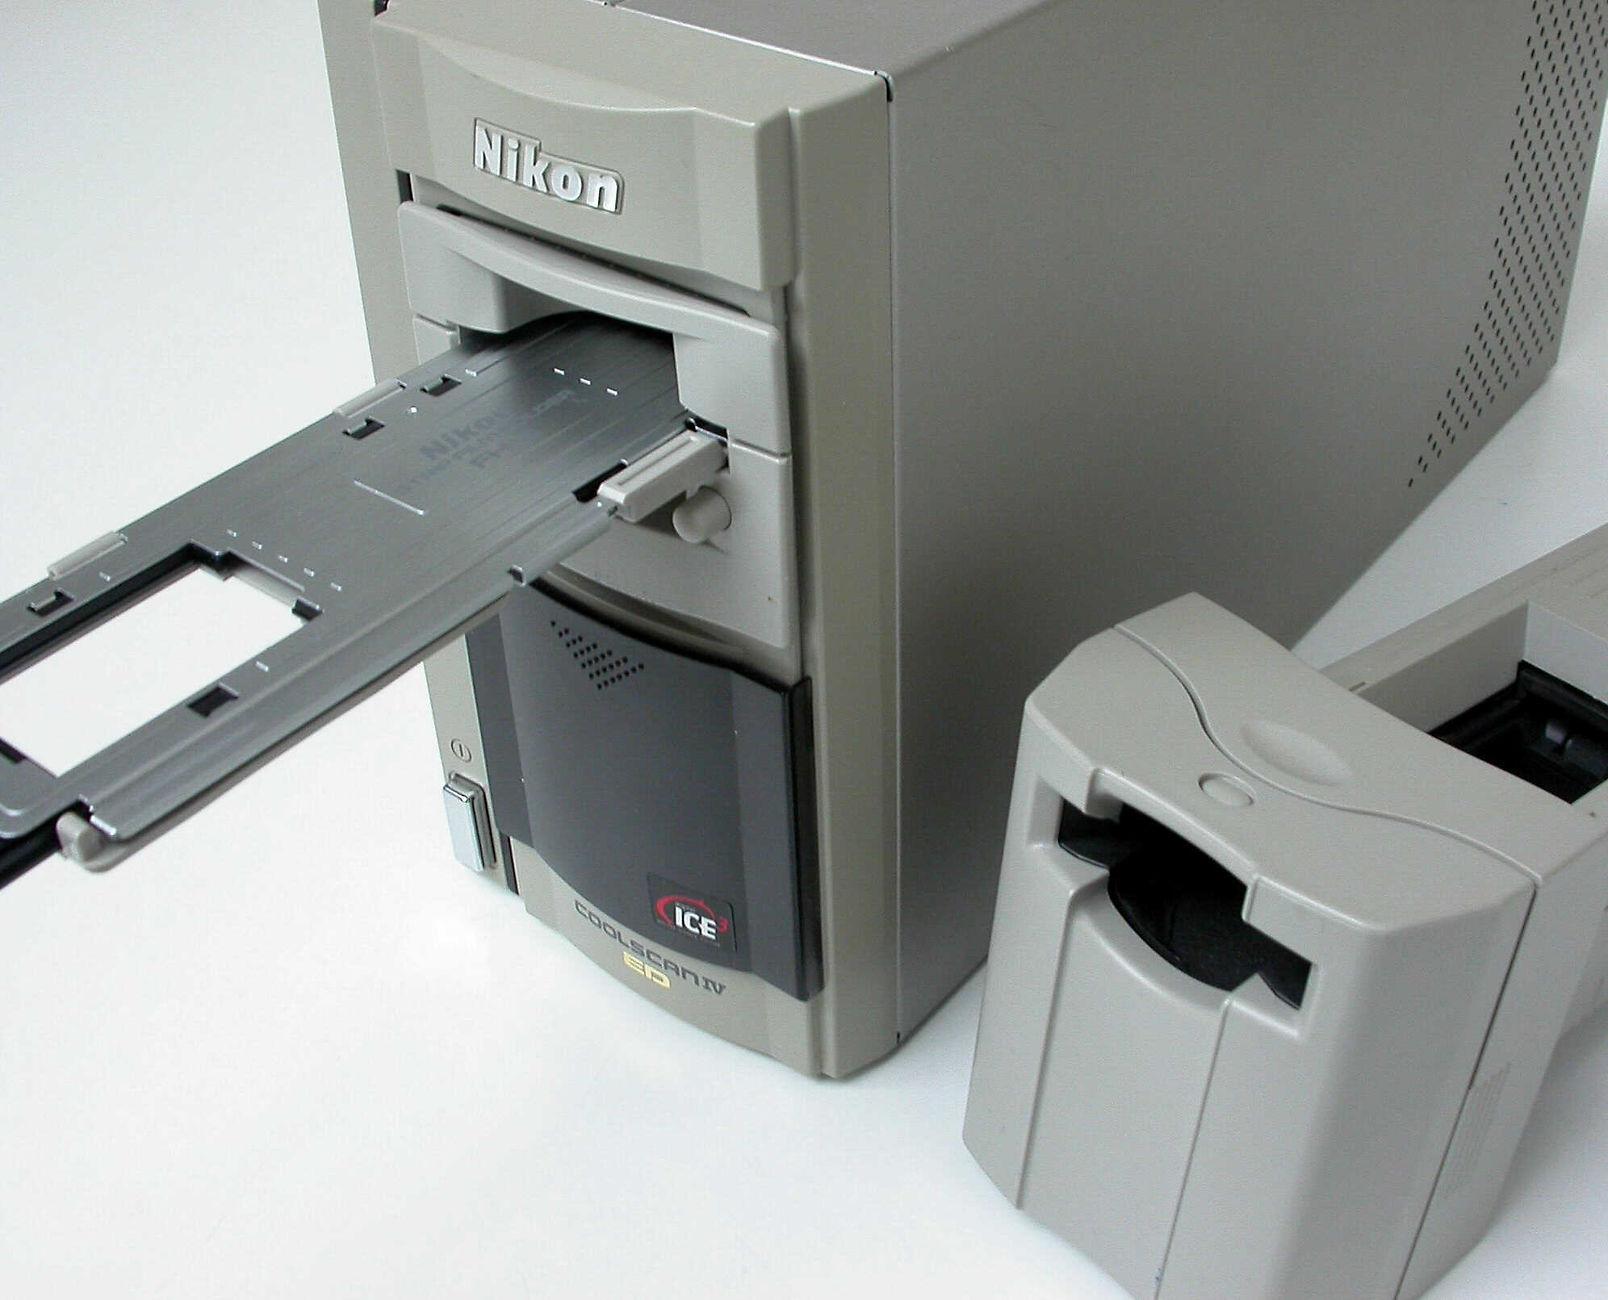 Nikon LS-4000ED Film Scanner (used at Image Science) Image